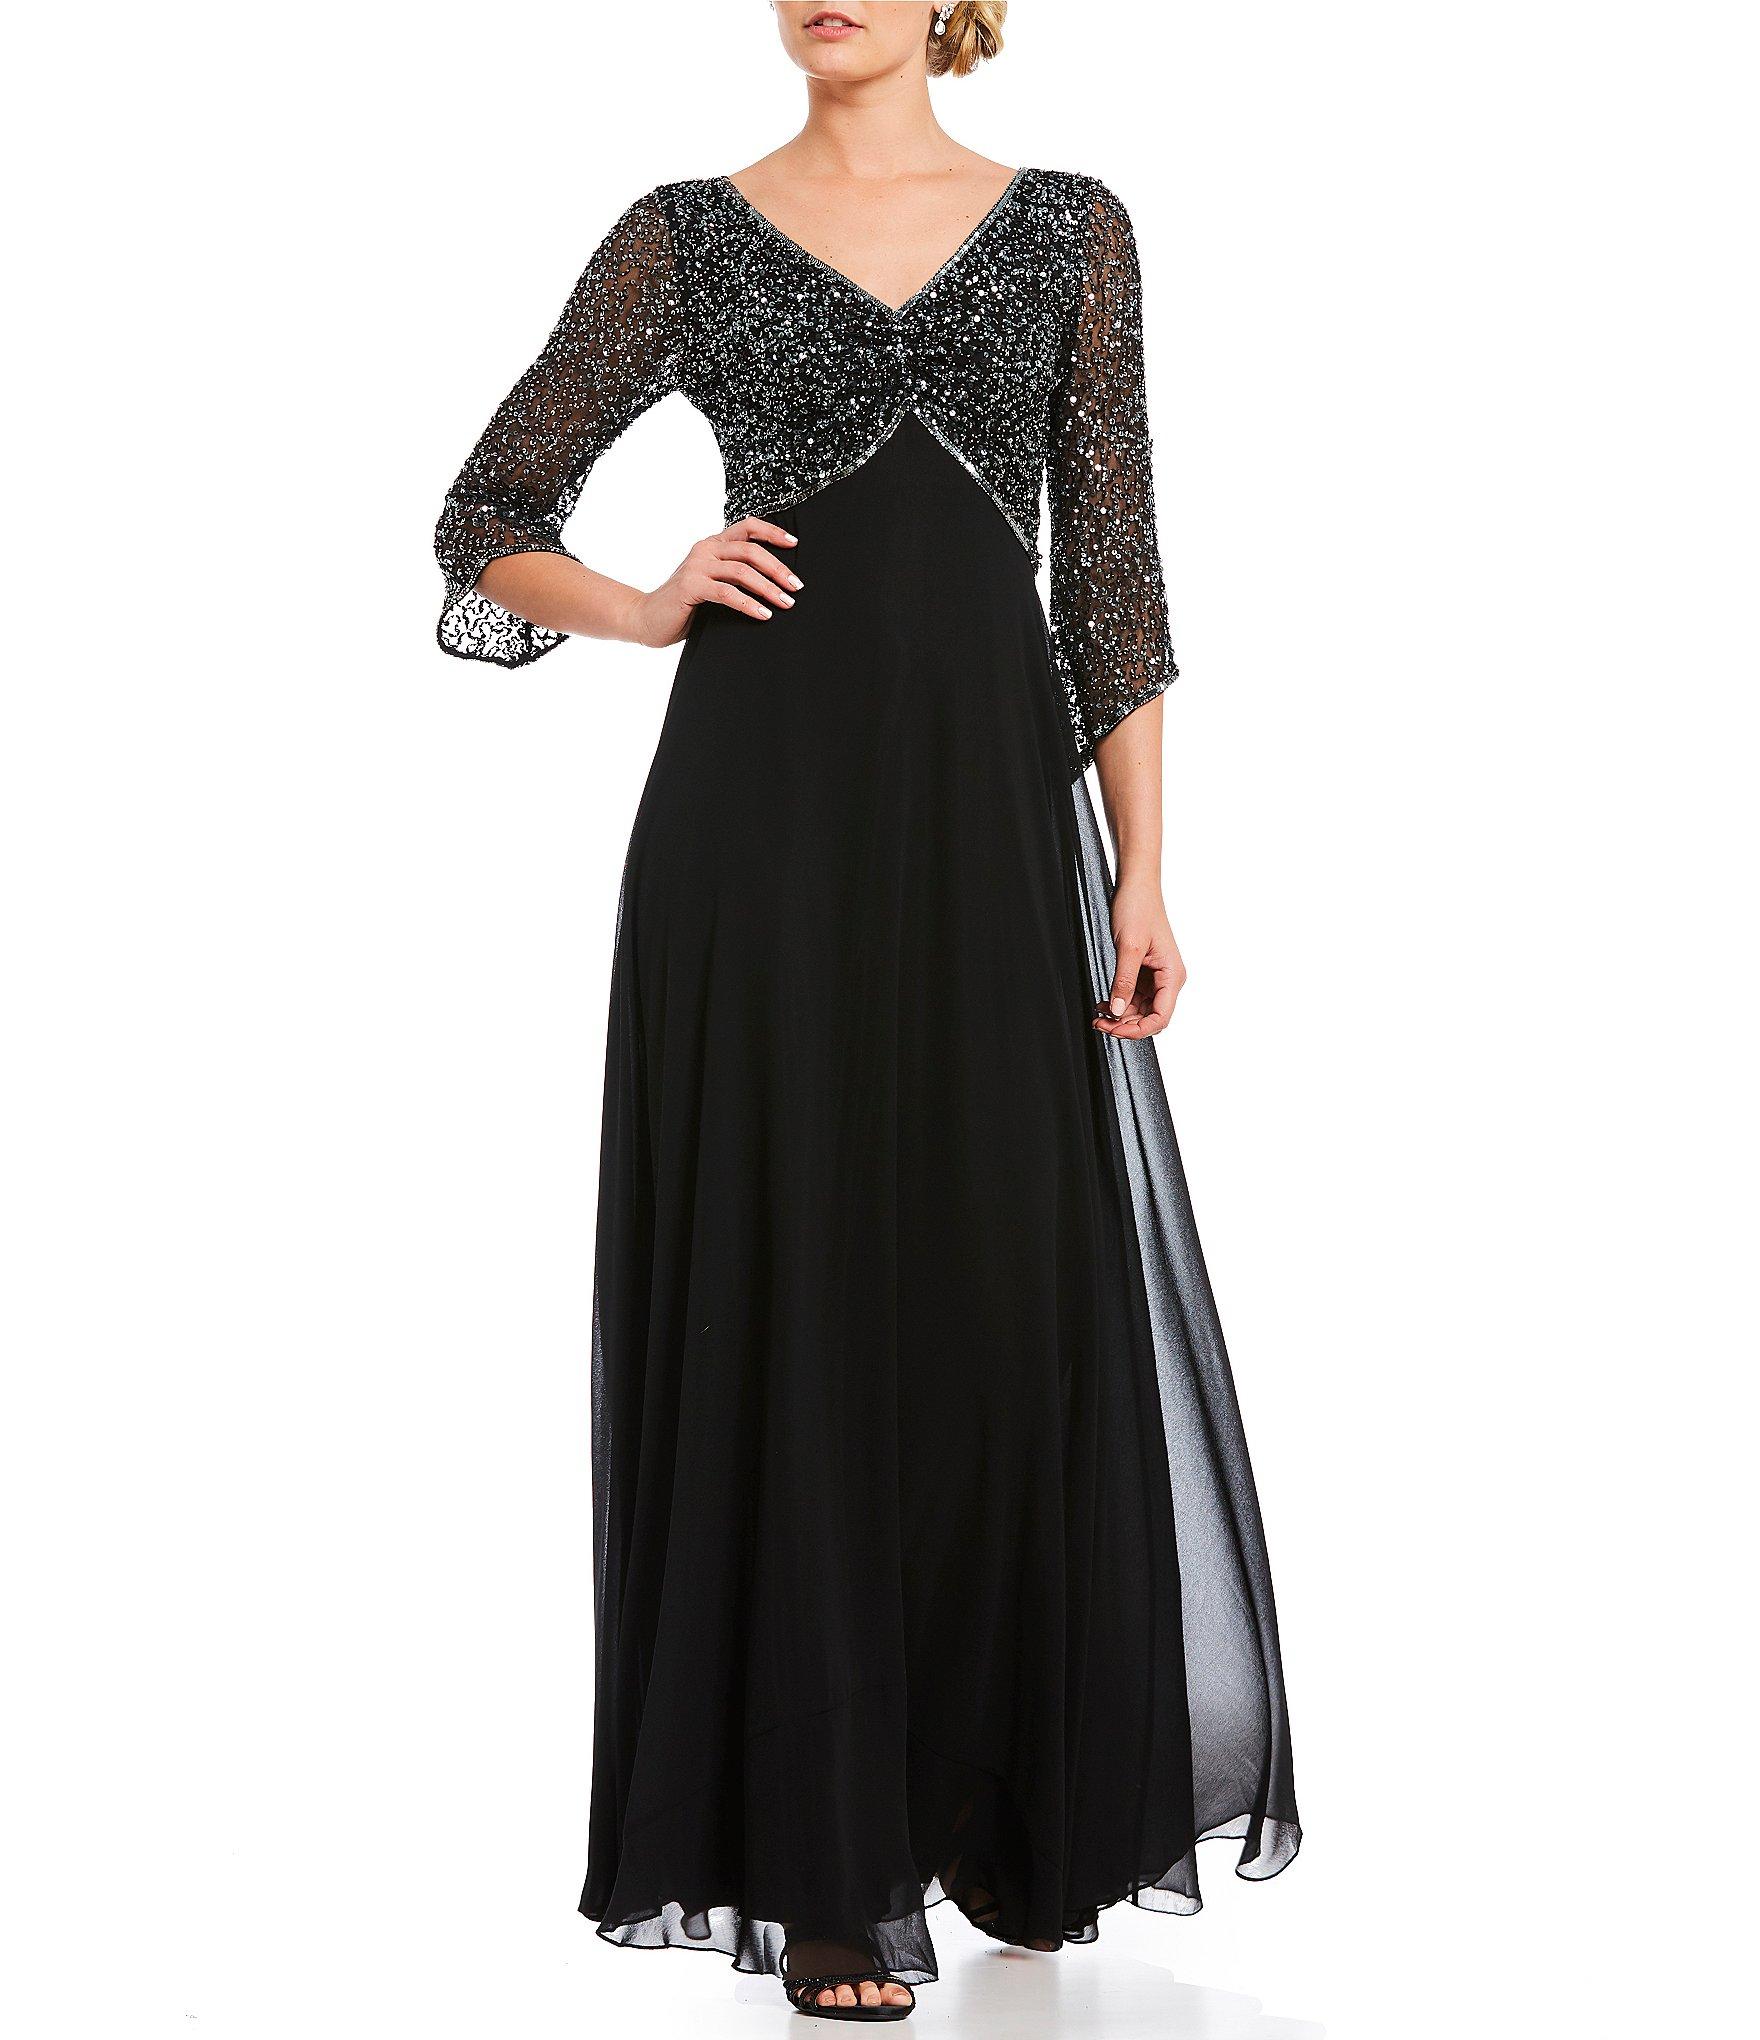 Star Wedding Dress Shop: Jkara V Neck Beaded Top Bodice Gown